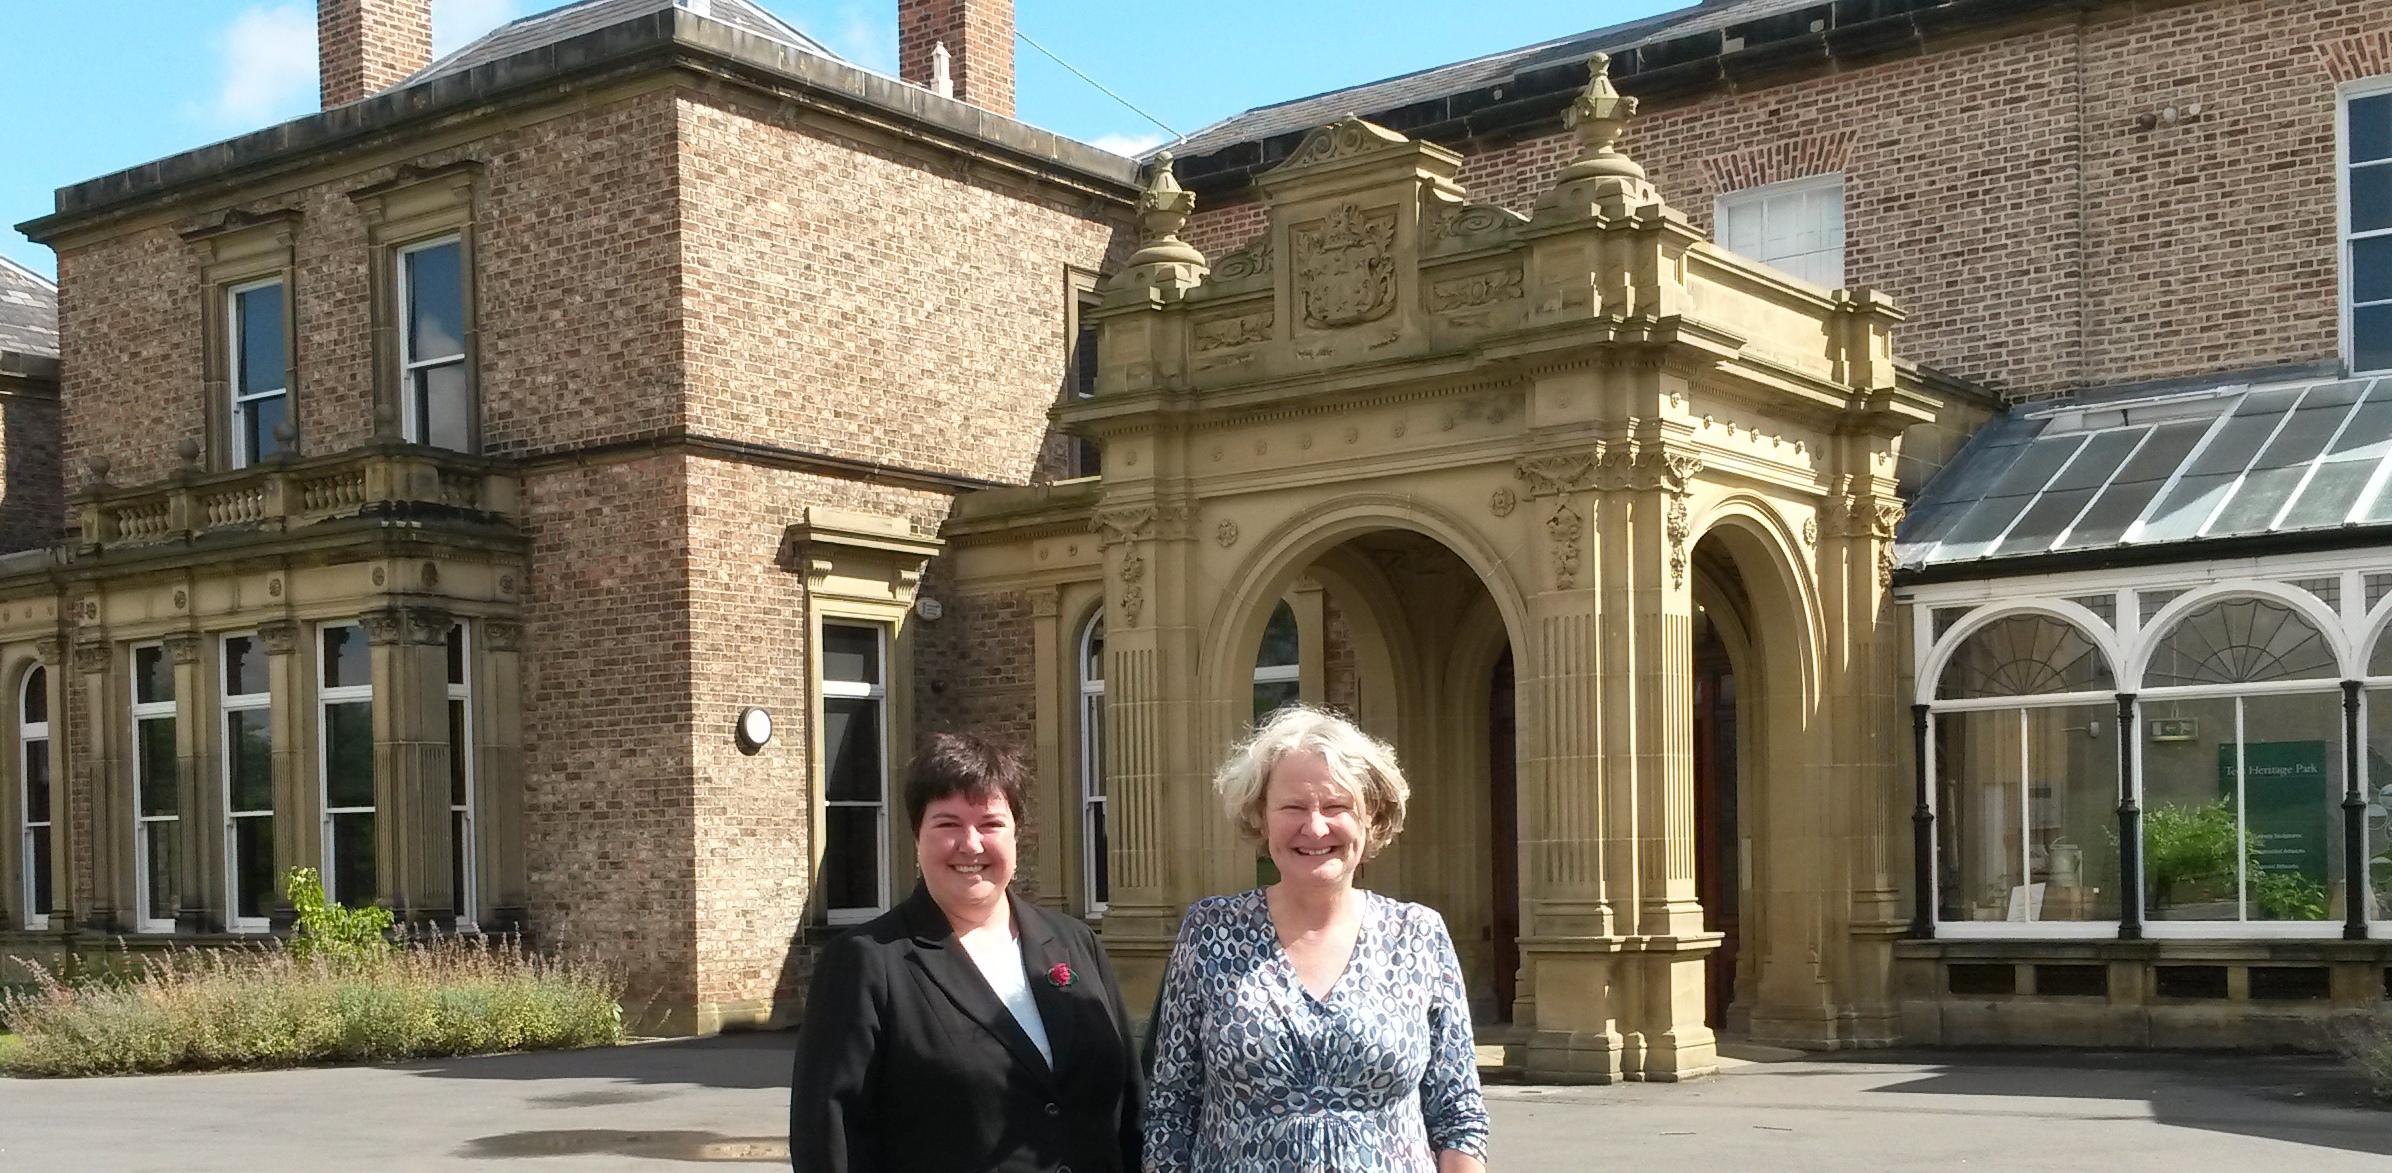 Preston_Park_with_Helen_Goodman_MP.jpg